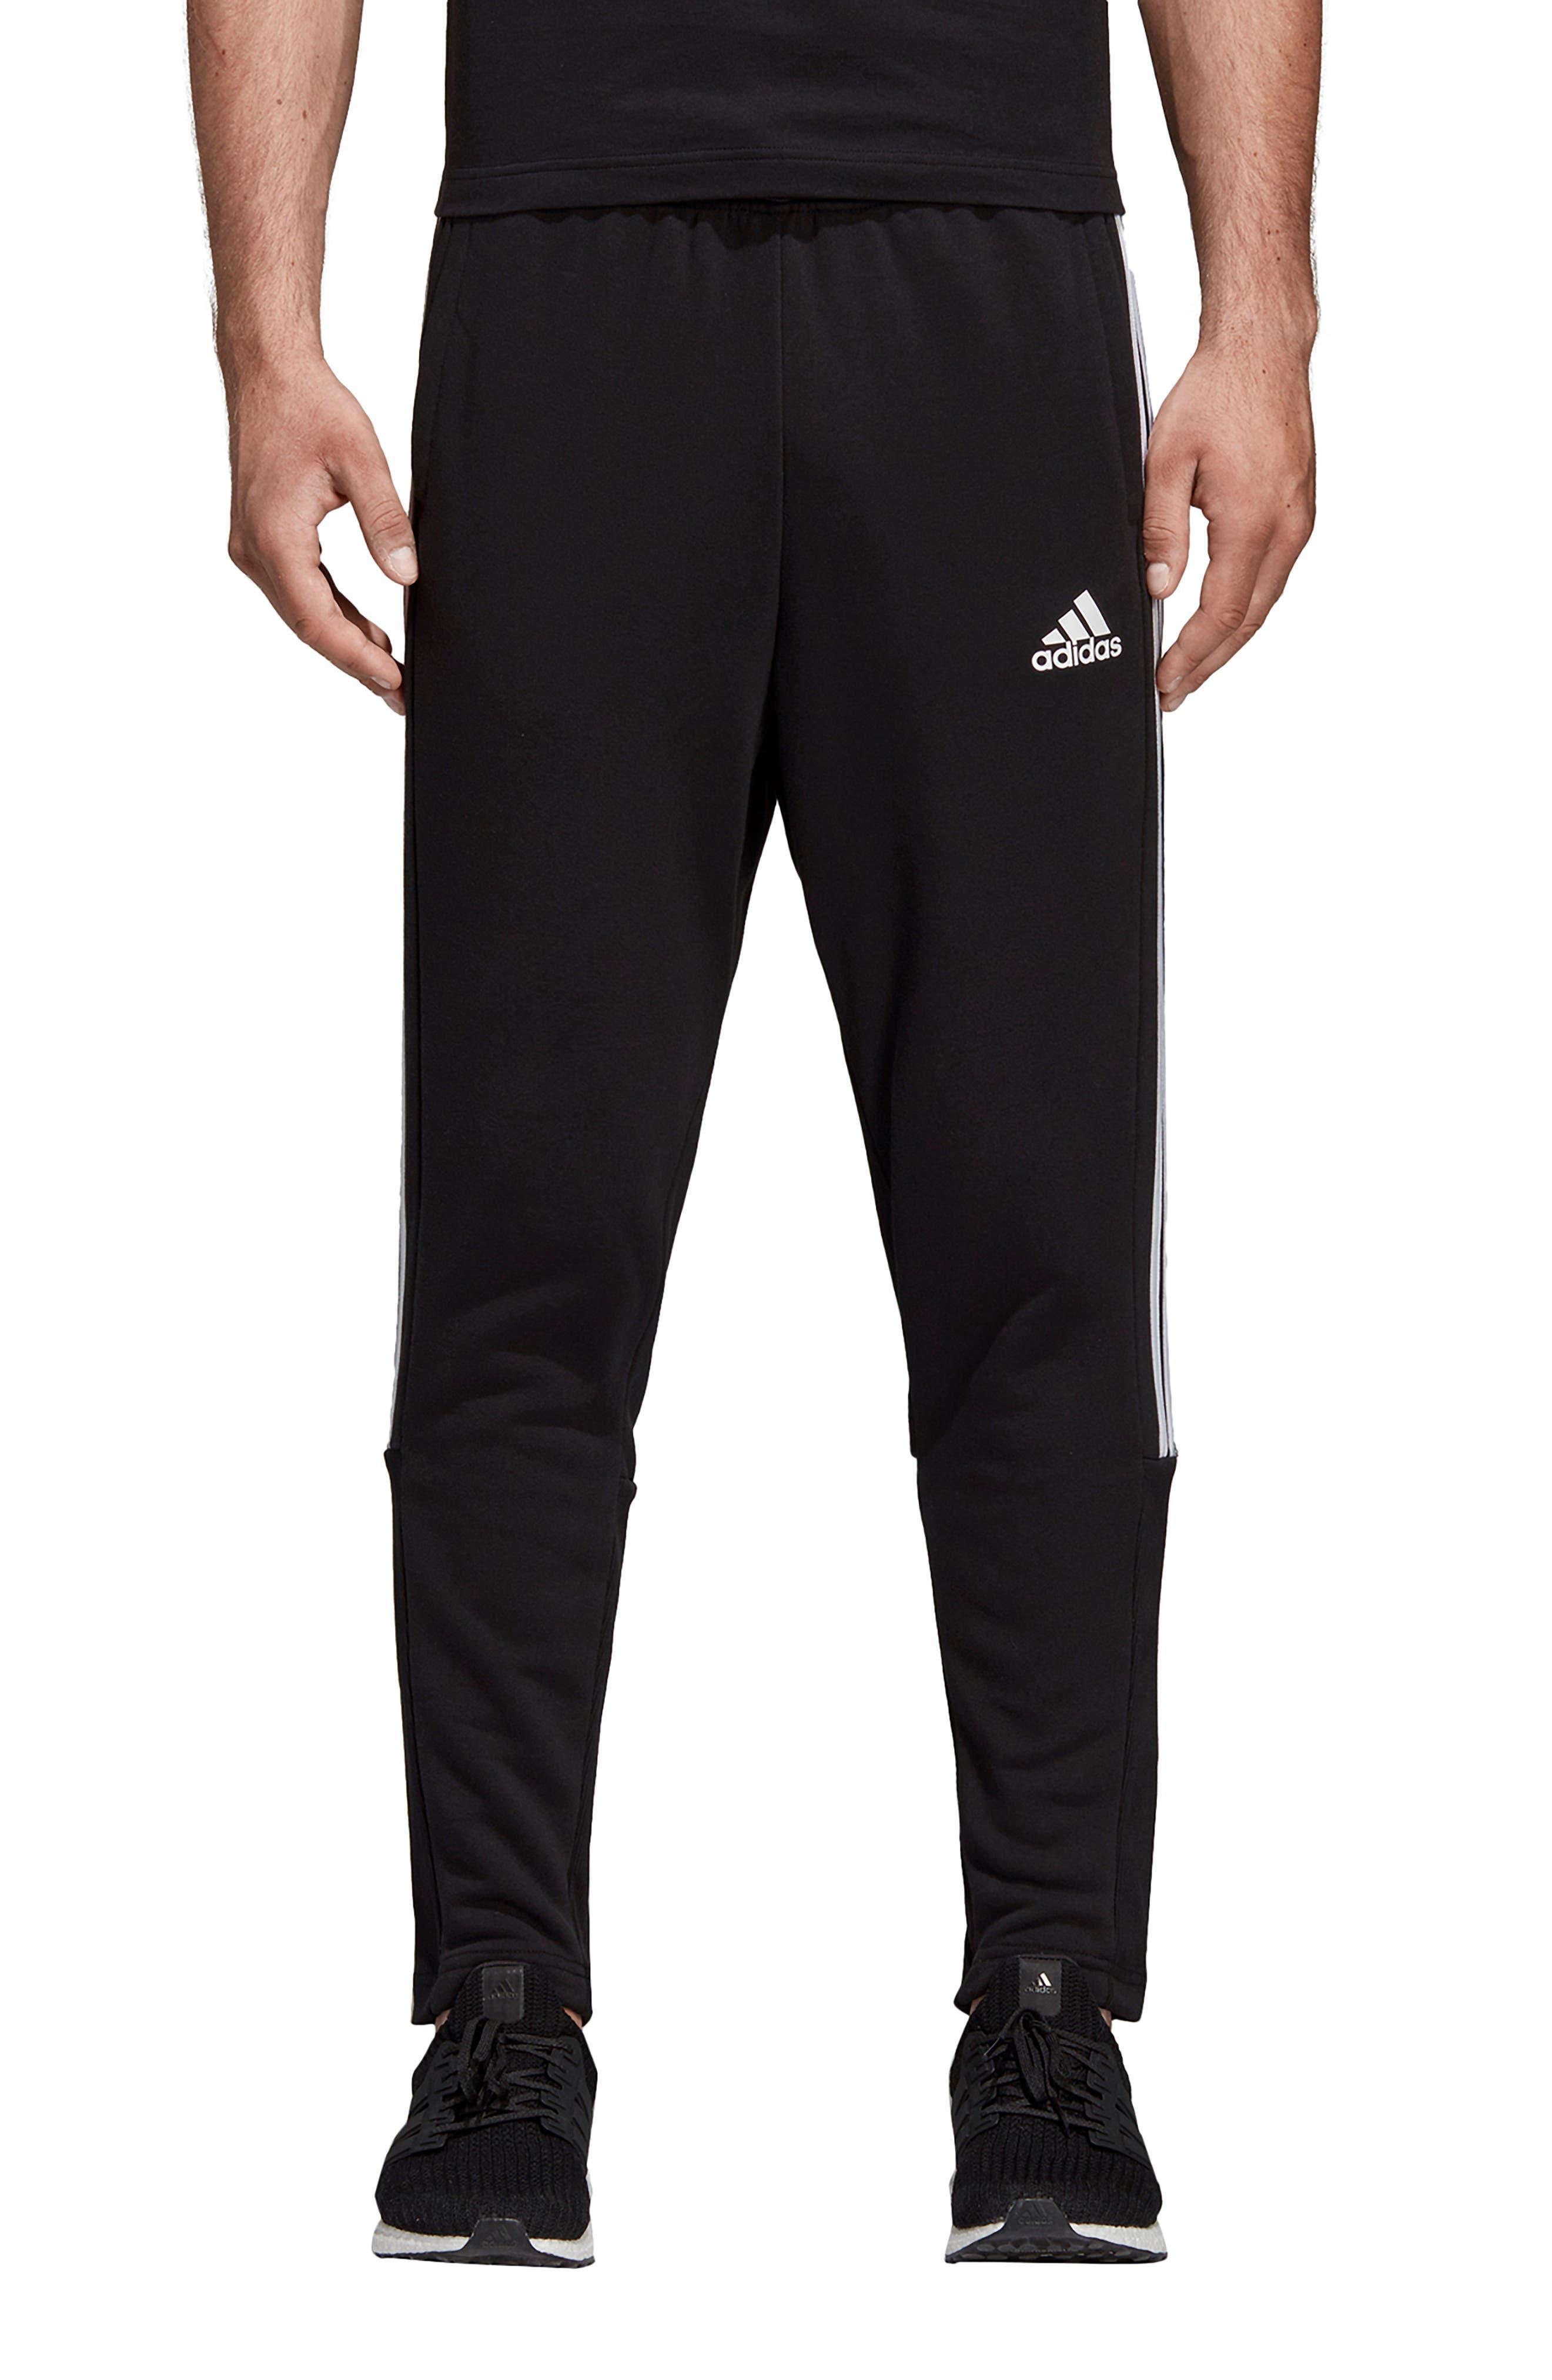 ADIDAS,                             MH 3S Tiro Sweatpants,                             Main thumbnail 1, color,                             BLACK/ WHITE